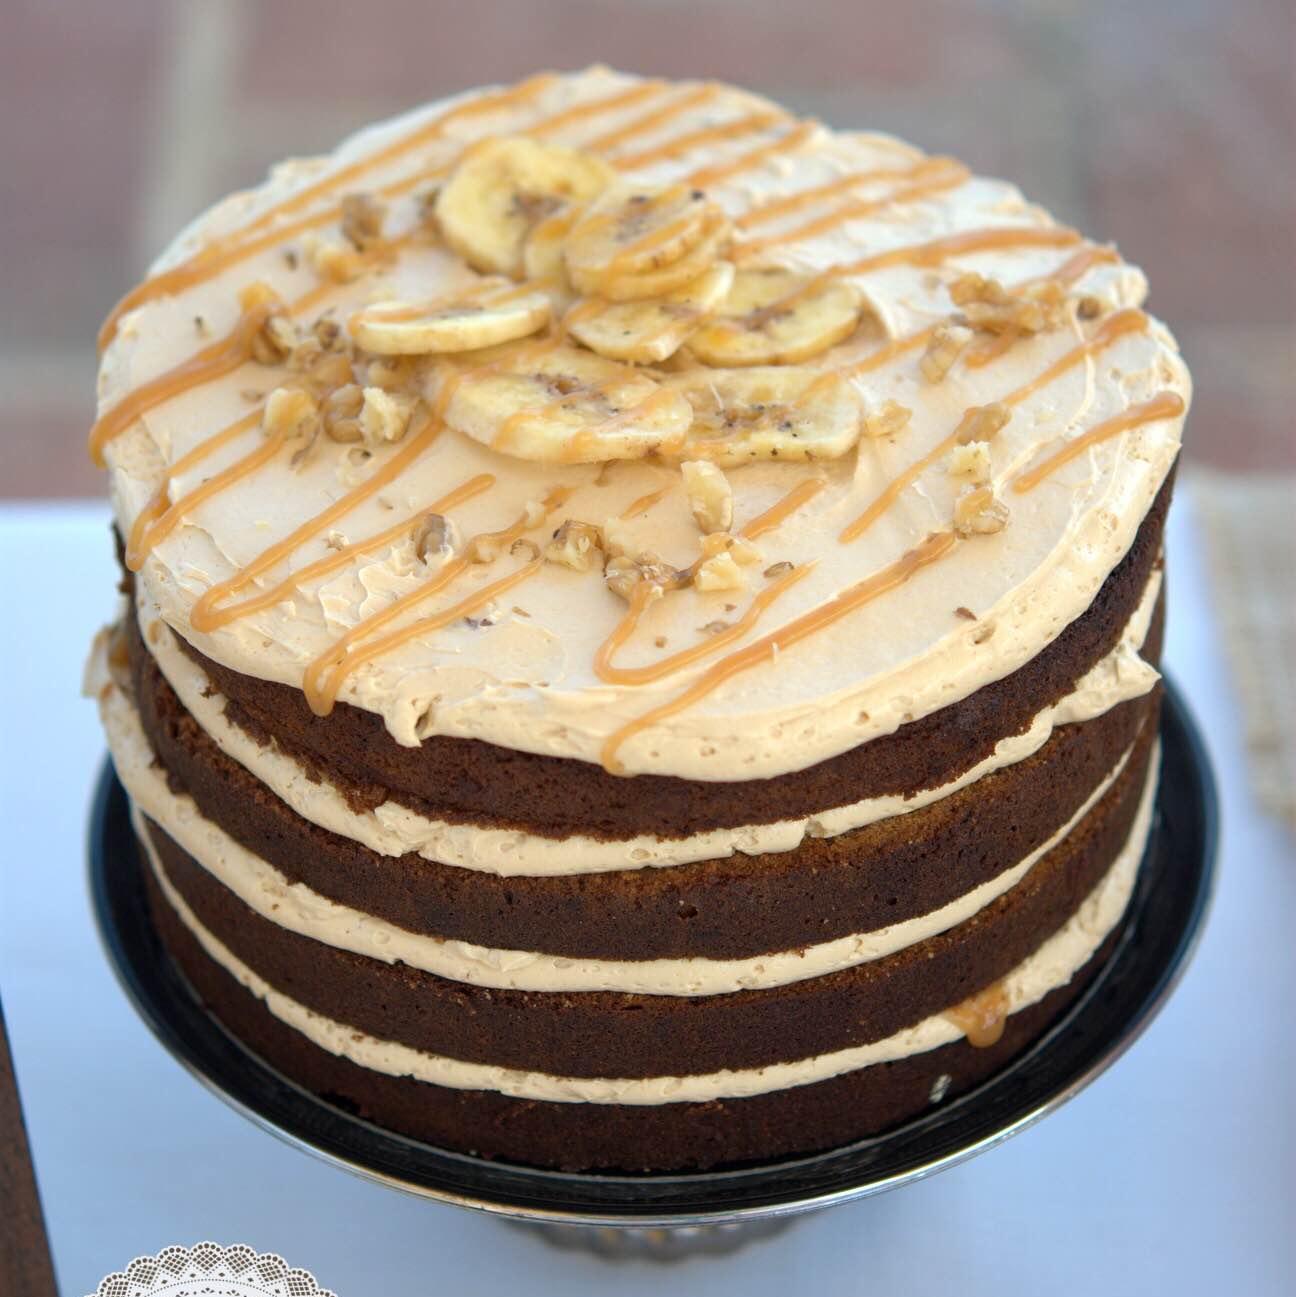 tarta-la-dolce-vita-platano-canela-dulce-de-leche-mericakes-layer-cake-naked-cake-barcelona